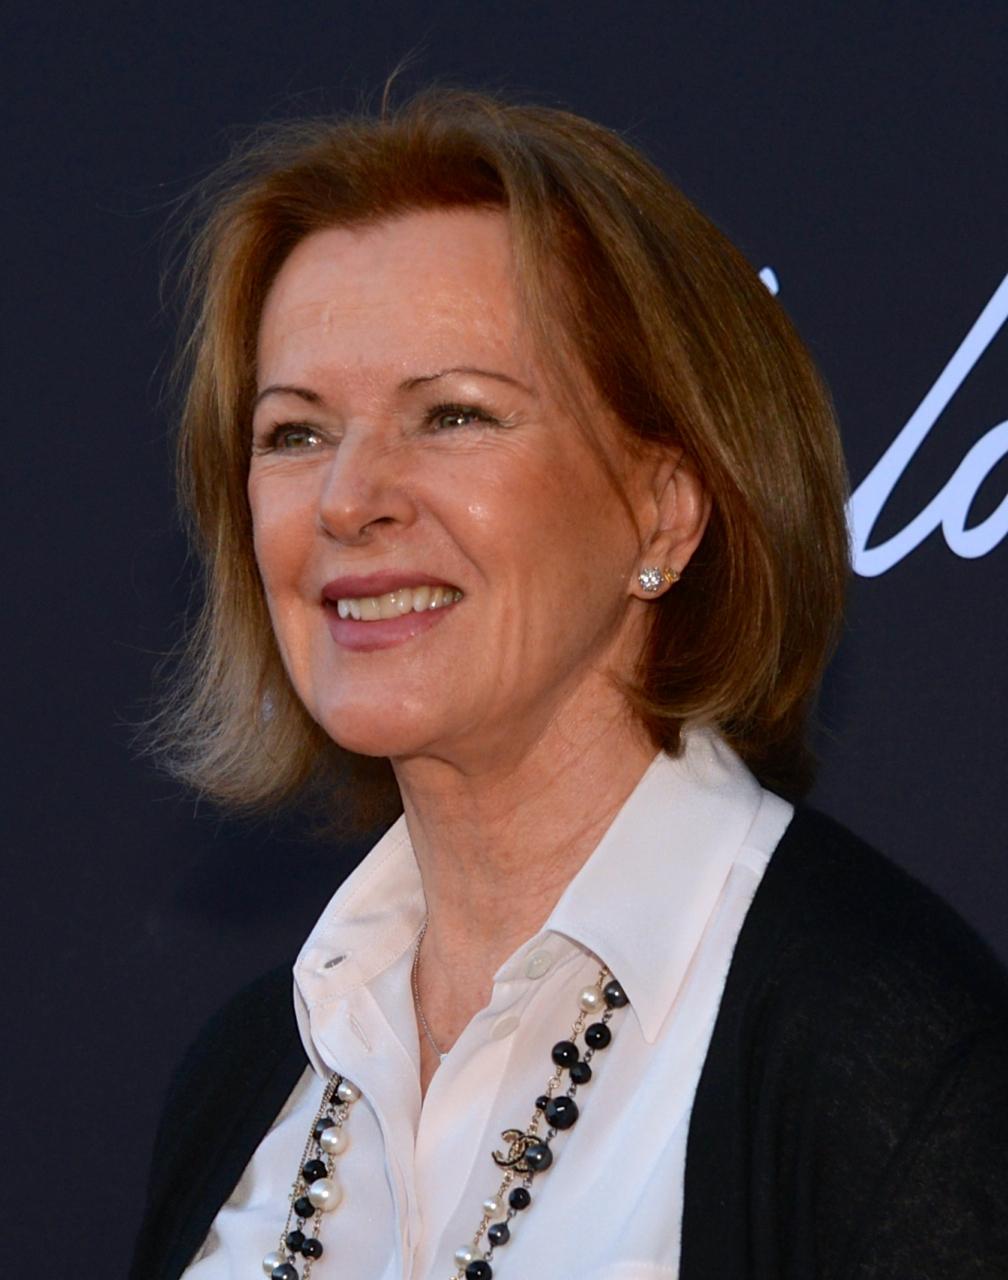 Anni-Frid Lyngstad in May 2013